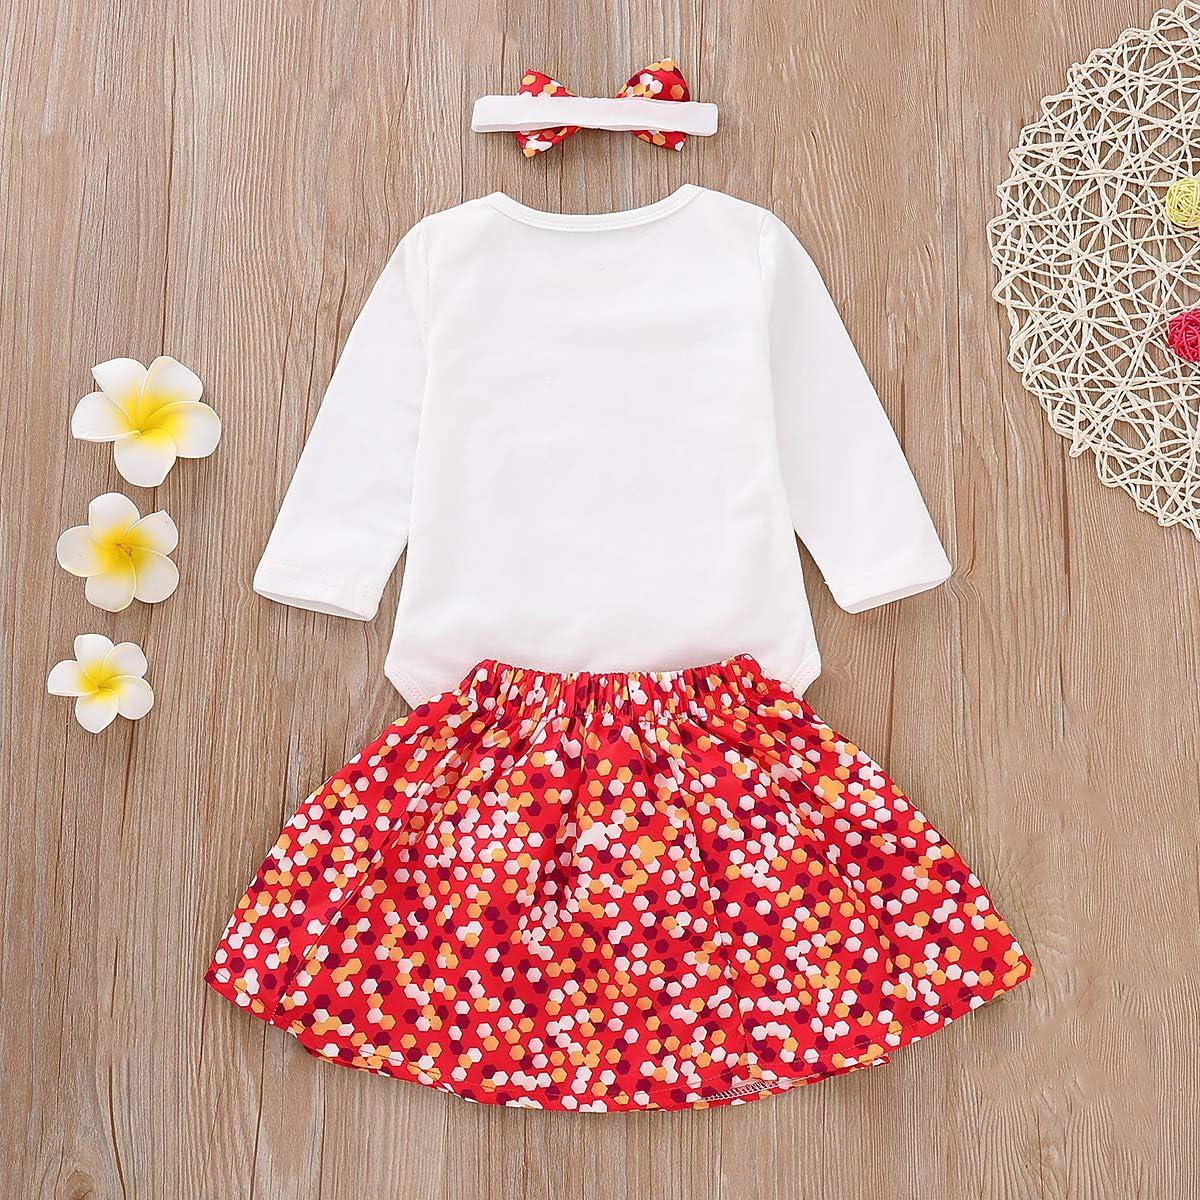 Newborn Baby Girls My First Christmas Long Sleeve Romper Polka Dot Skirt Outfits